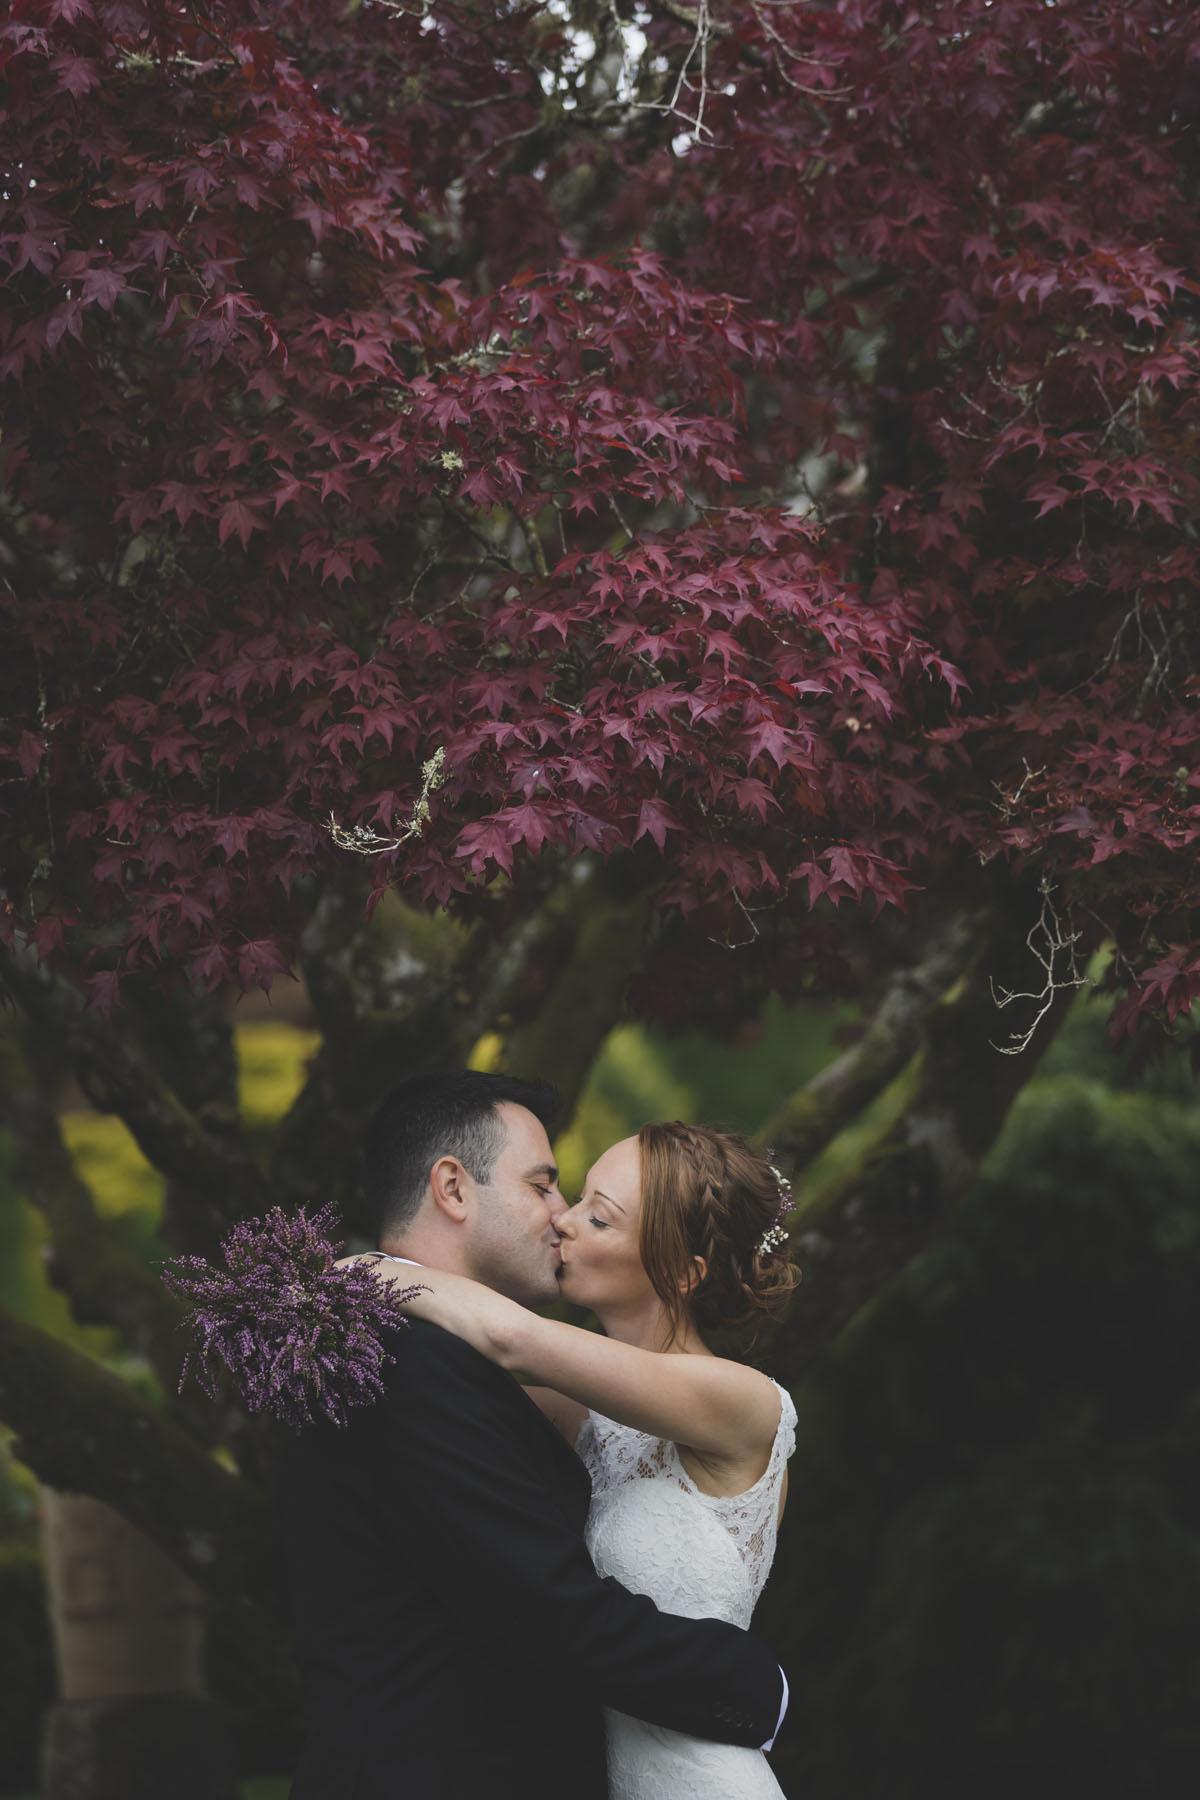 pulmafotod-075-scotland-destination-wedding.jpg